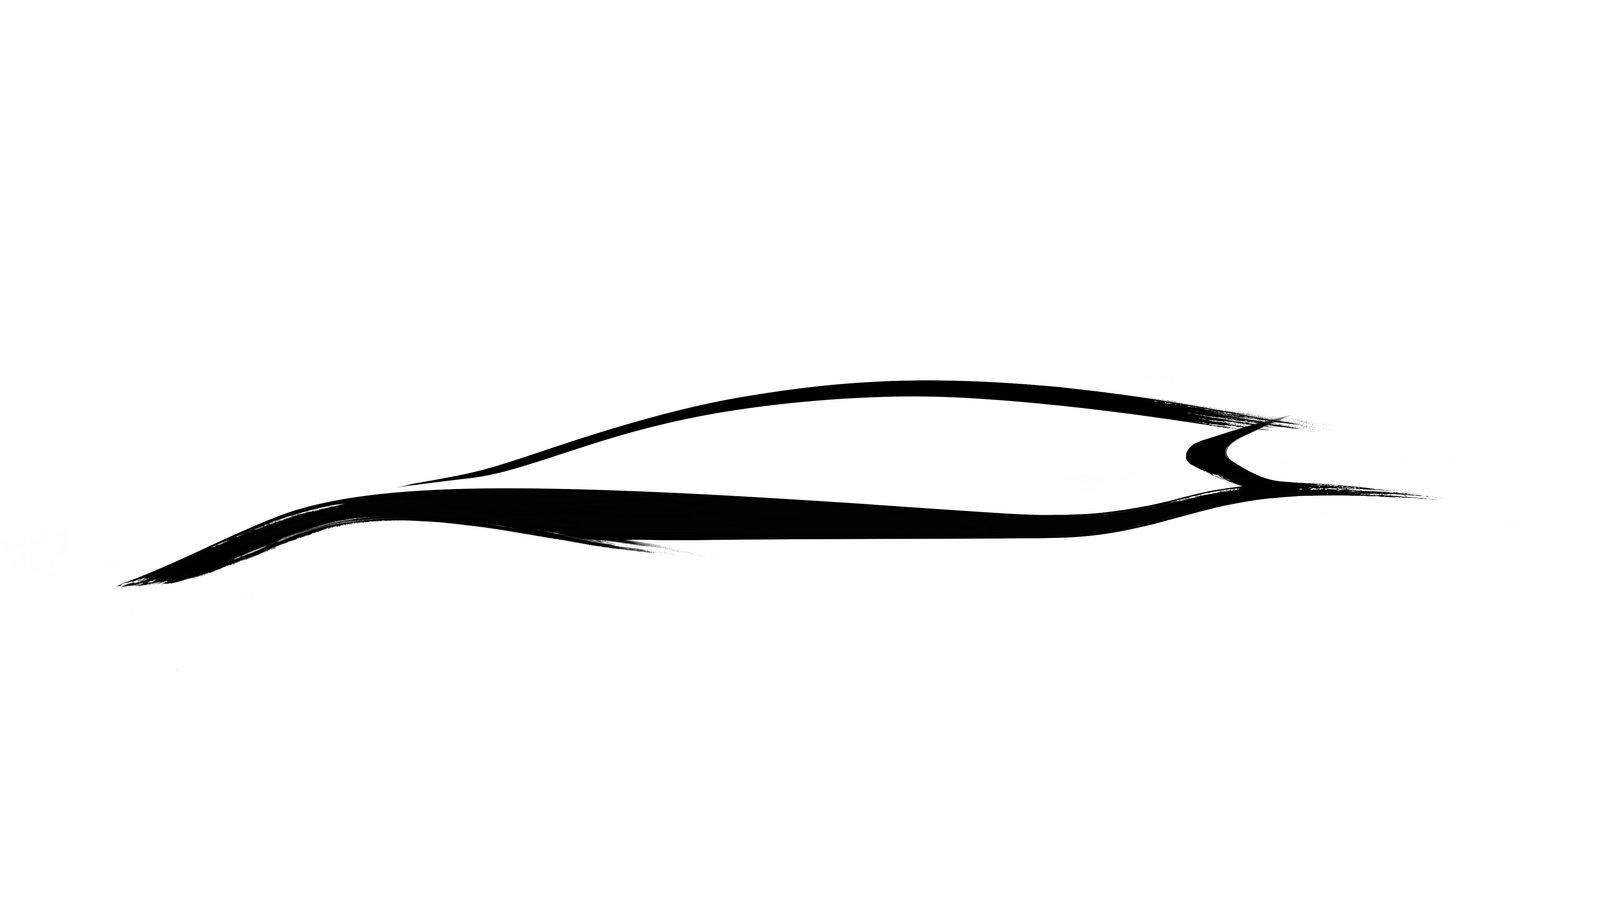 Geneva Preshow Infiniti Outlines New Concept For Entry